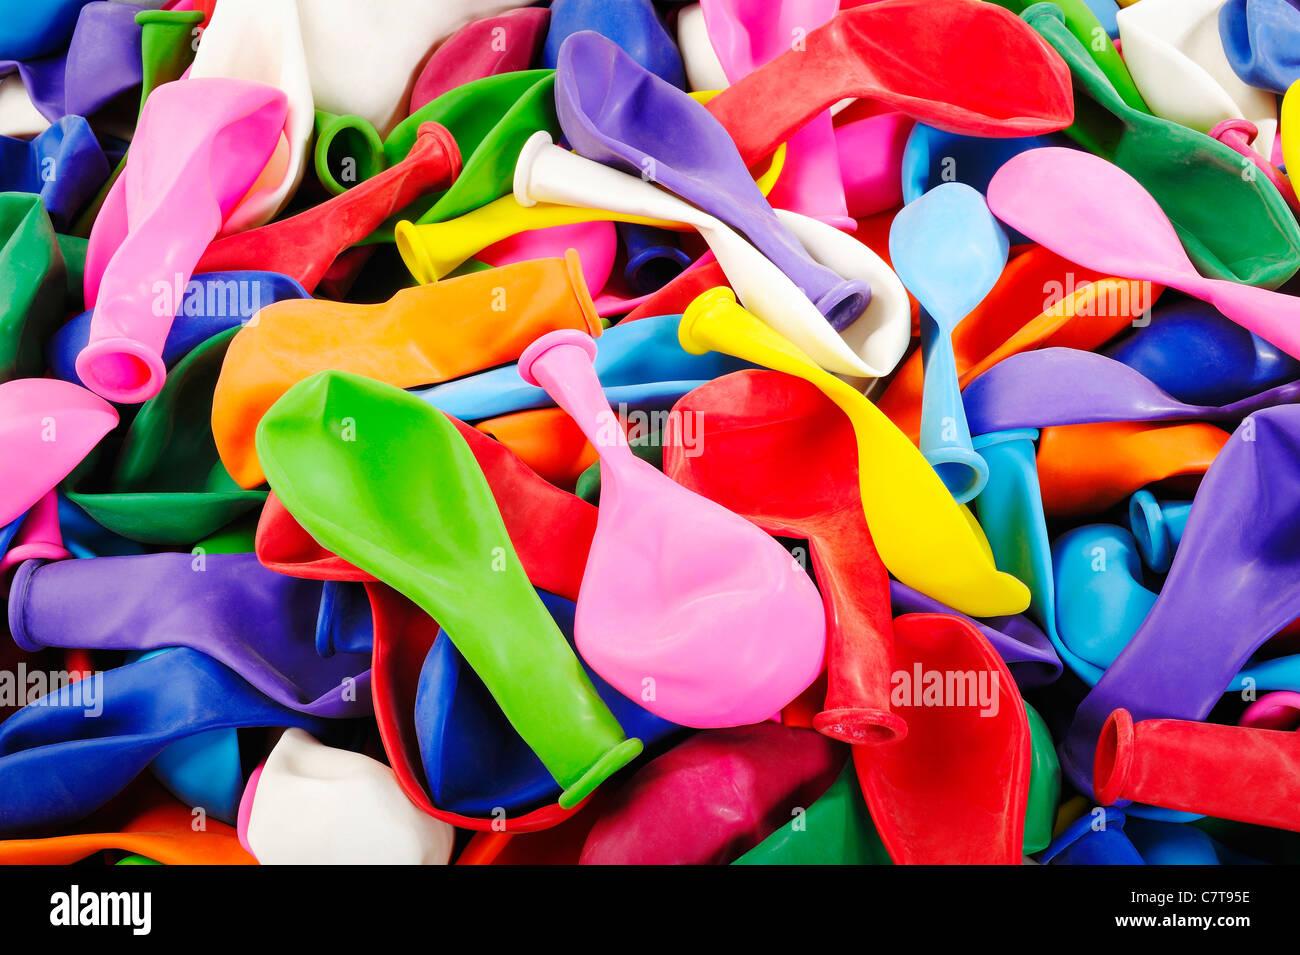 Globos de colores Imagen De Stock